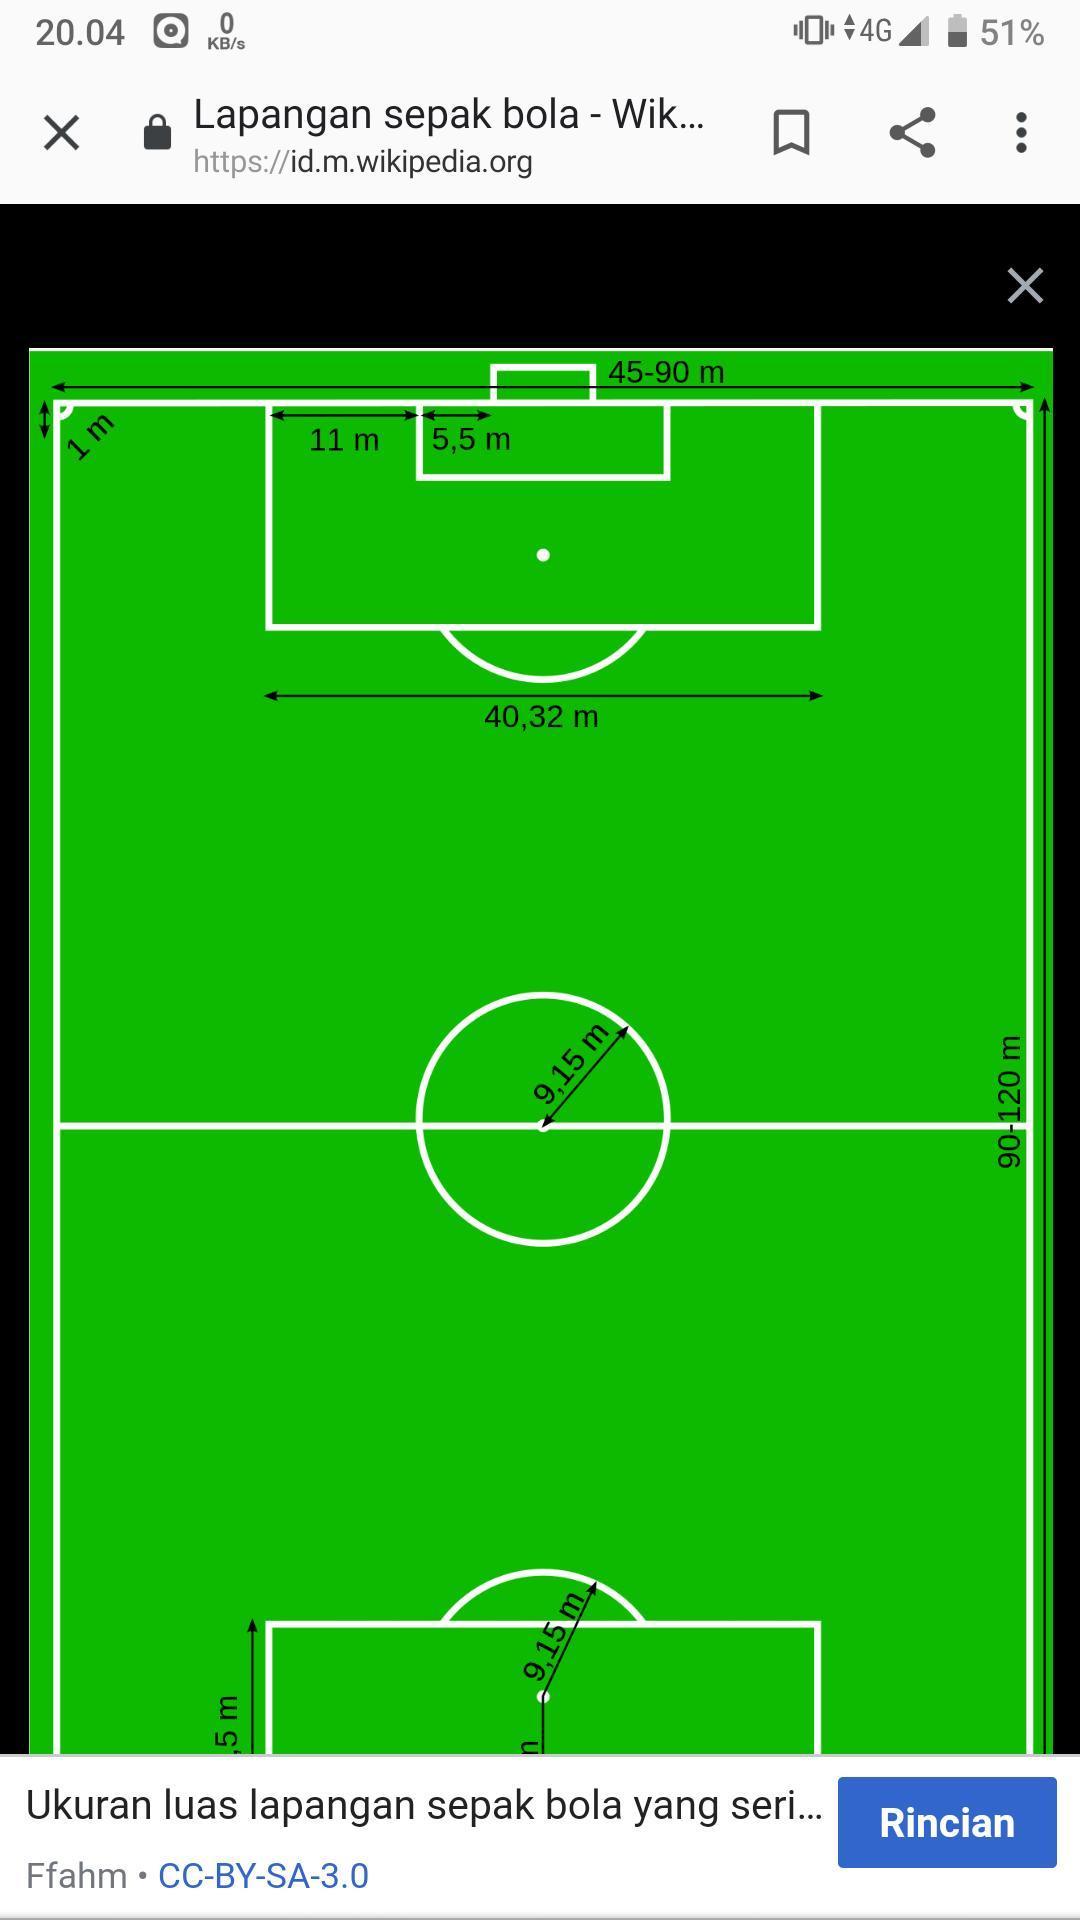 Gambarkan Lapangan Sepak Bola Besrta Ukuran Brainly Co Id